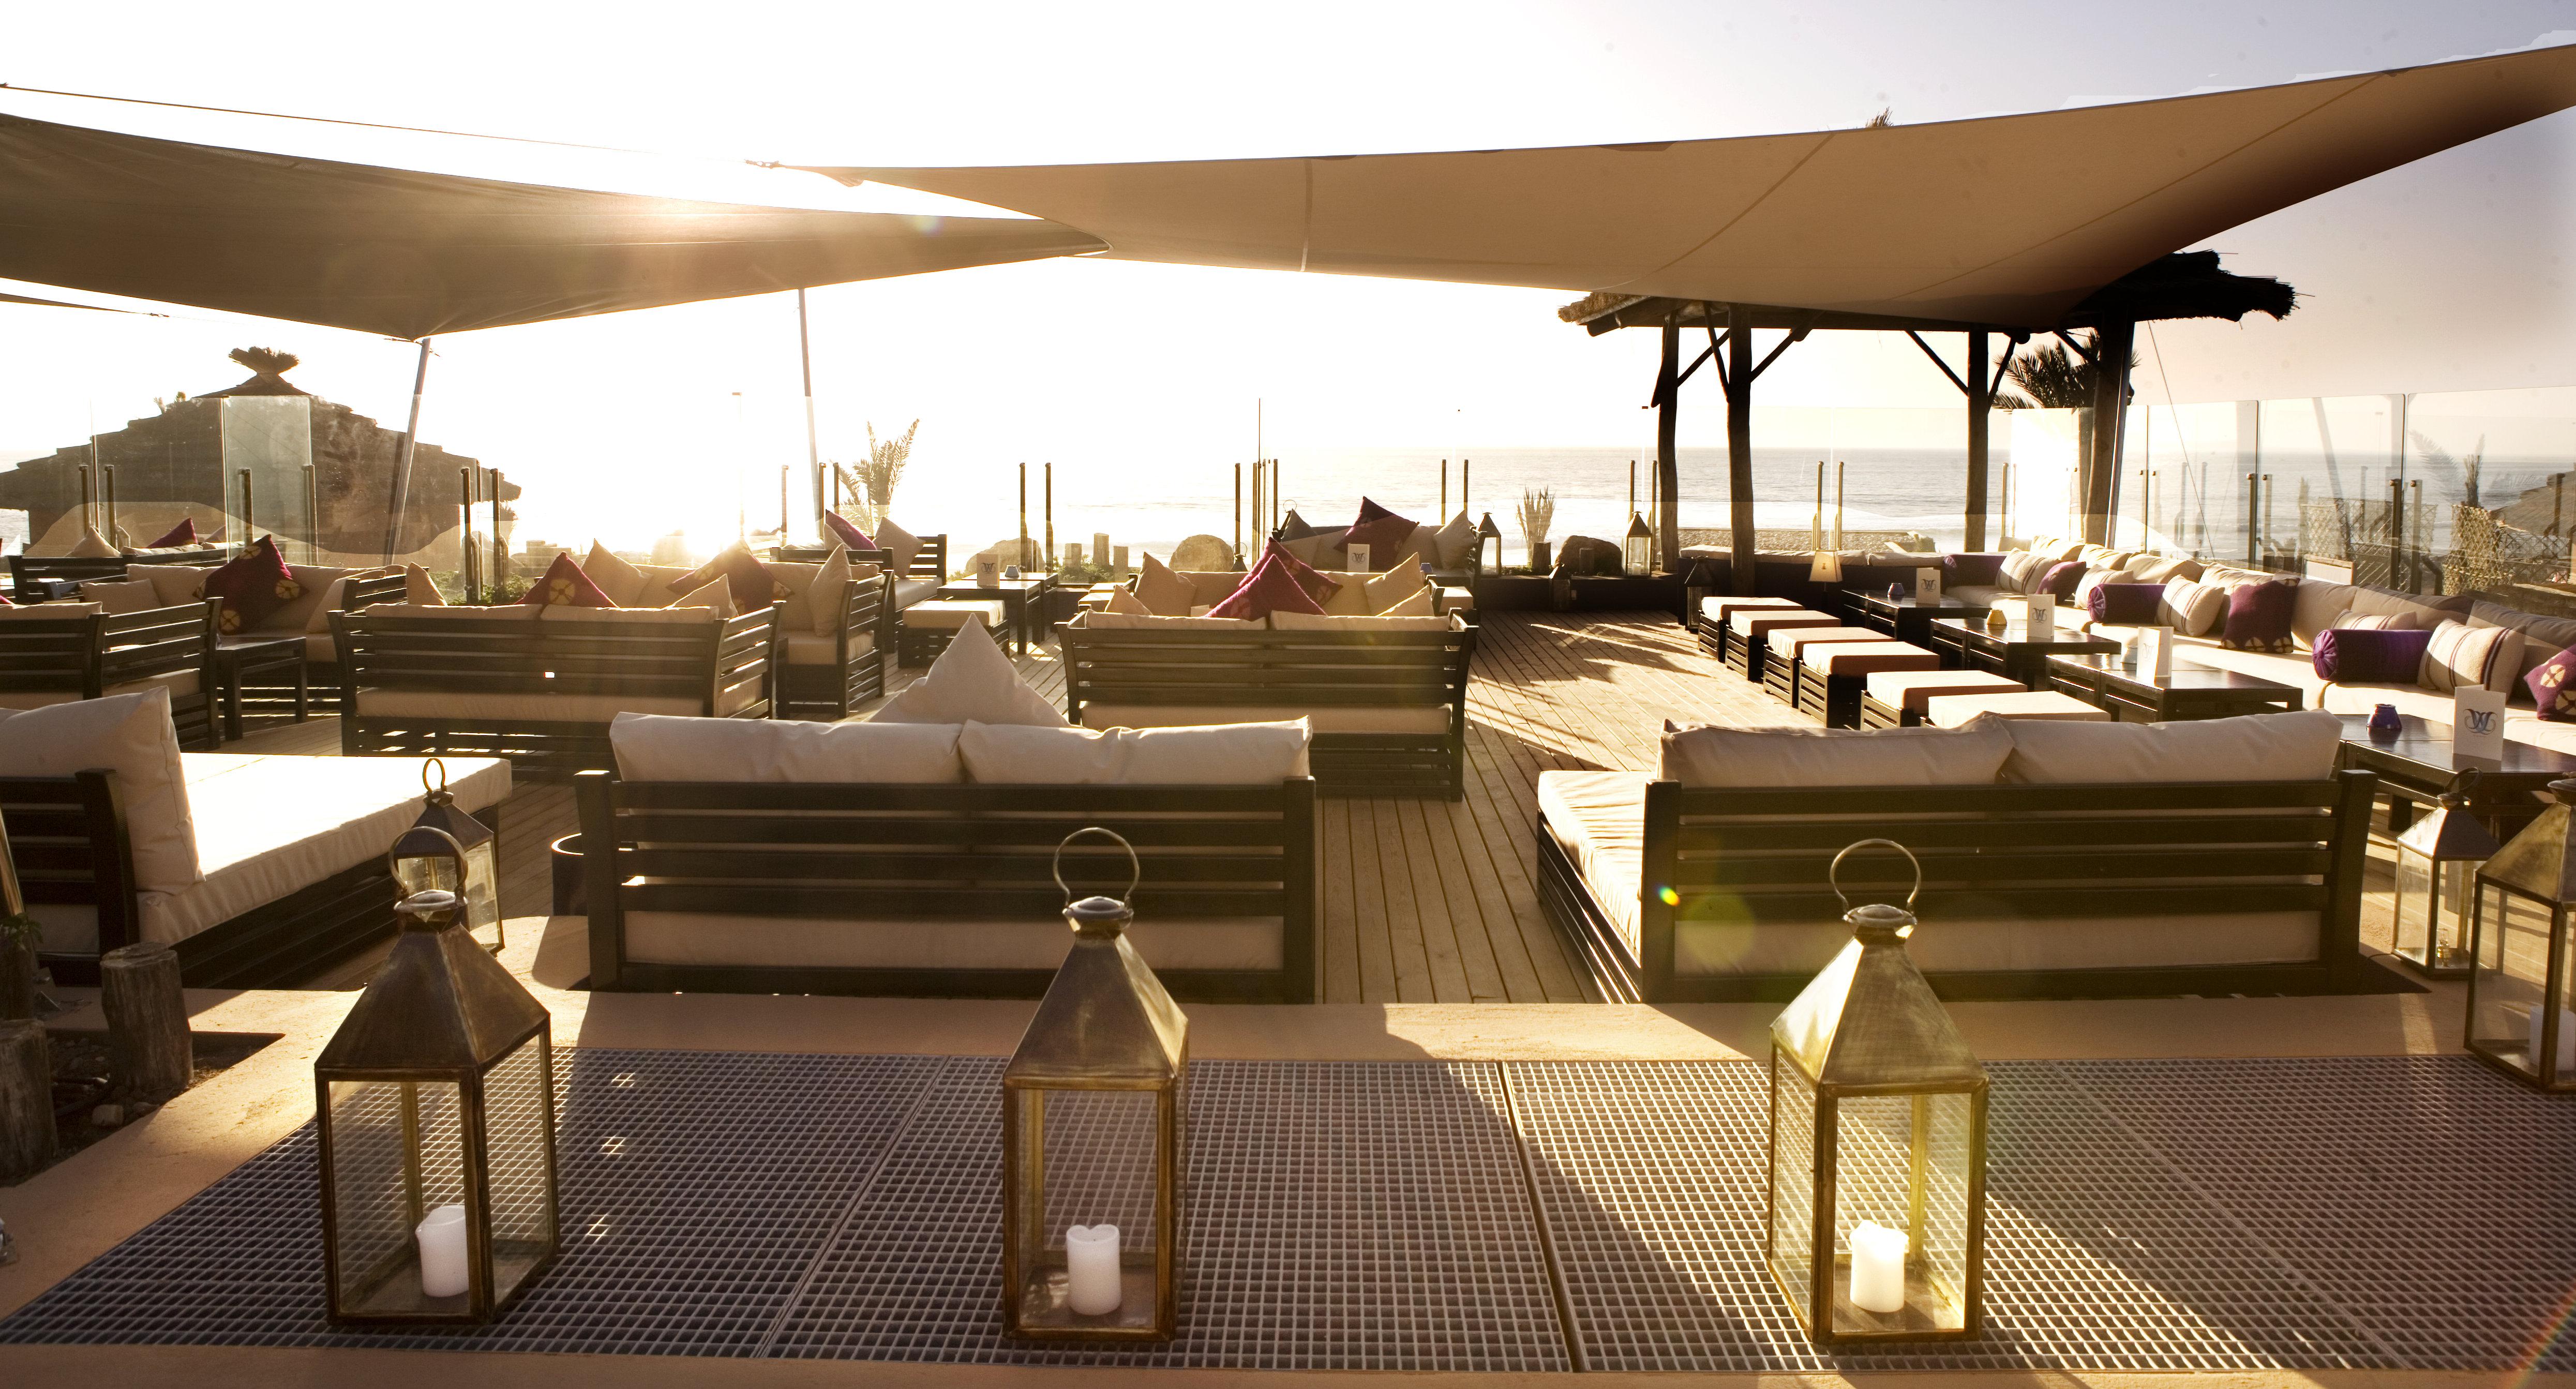 paradis-plage-yoga-beach-spa-resort